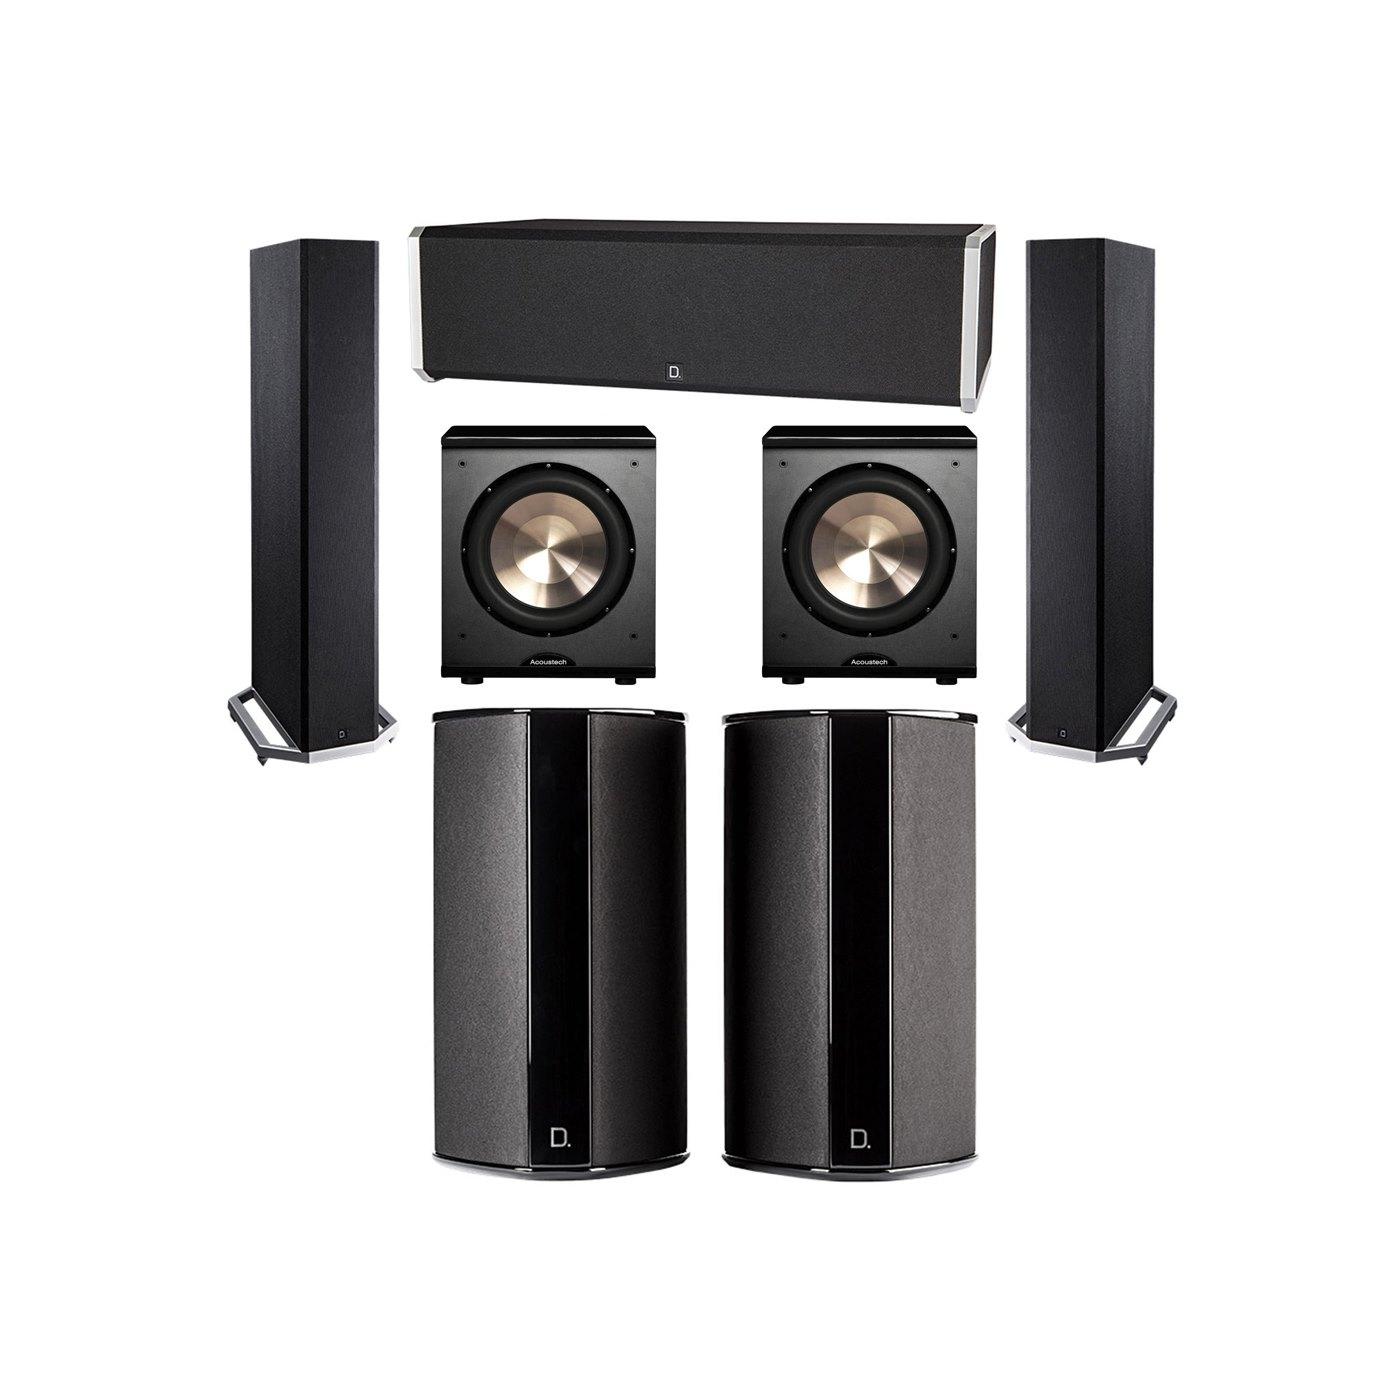 Definitive Technology 5.2 System with 2 BP9020 Tower Speakers, 1 CS9040 Center Channel Speaker, 2 SR9080 Surround Speaker, 2 BIC PL-200 Subwoofer